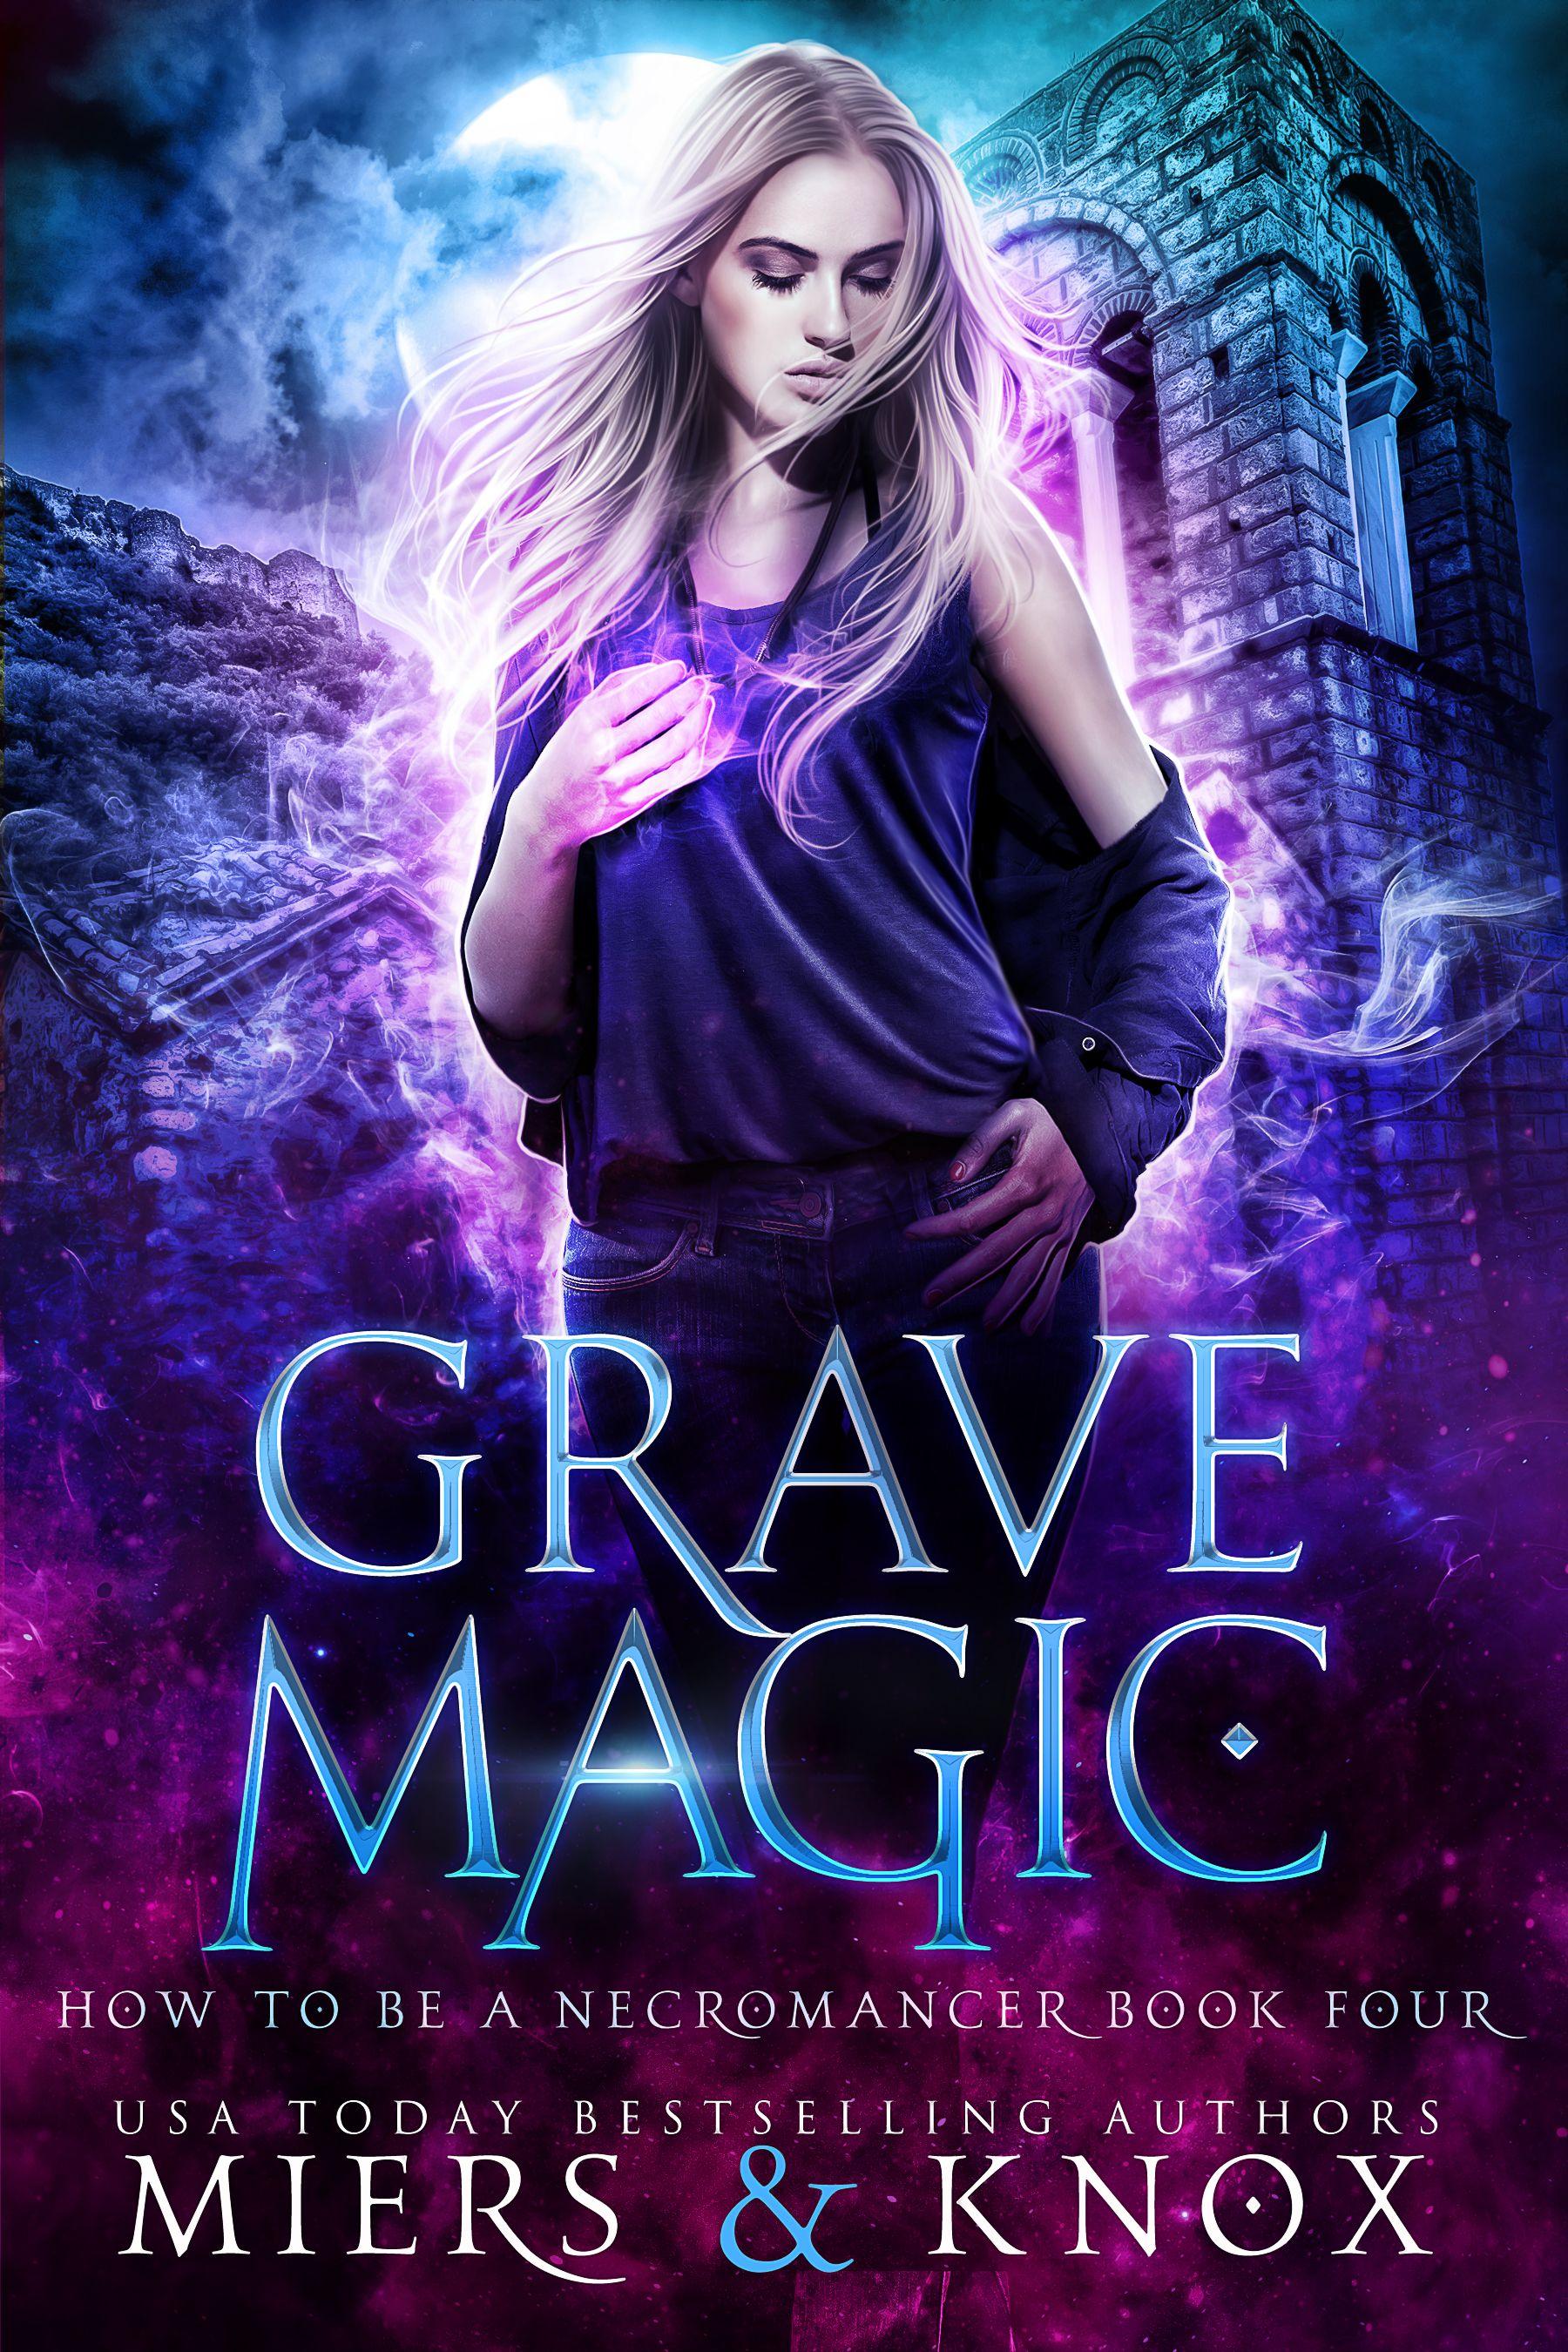 Grave Magic - How to Be a Necromancer Series #Necromancers